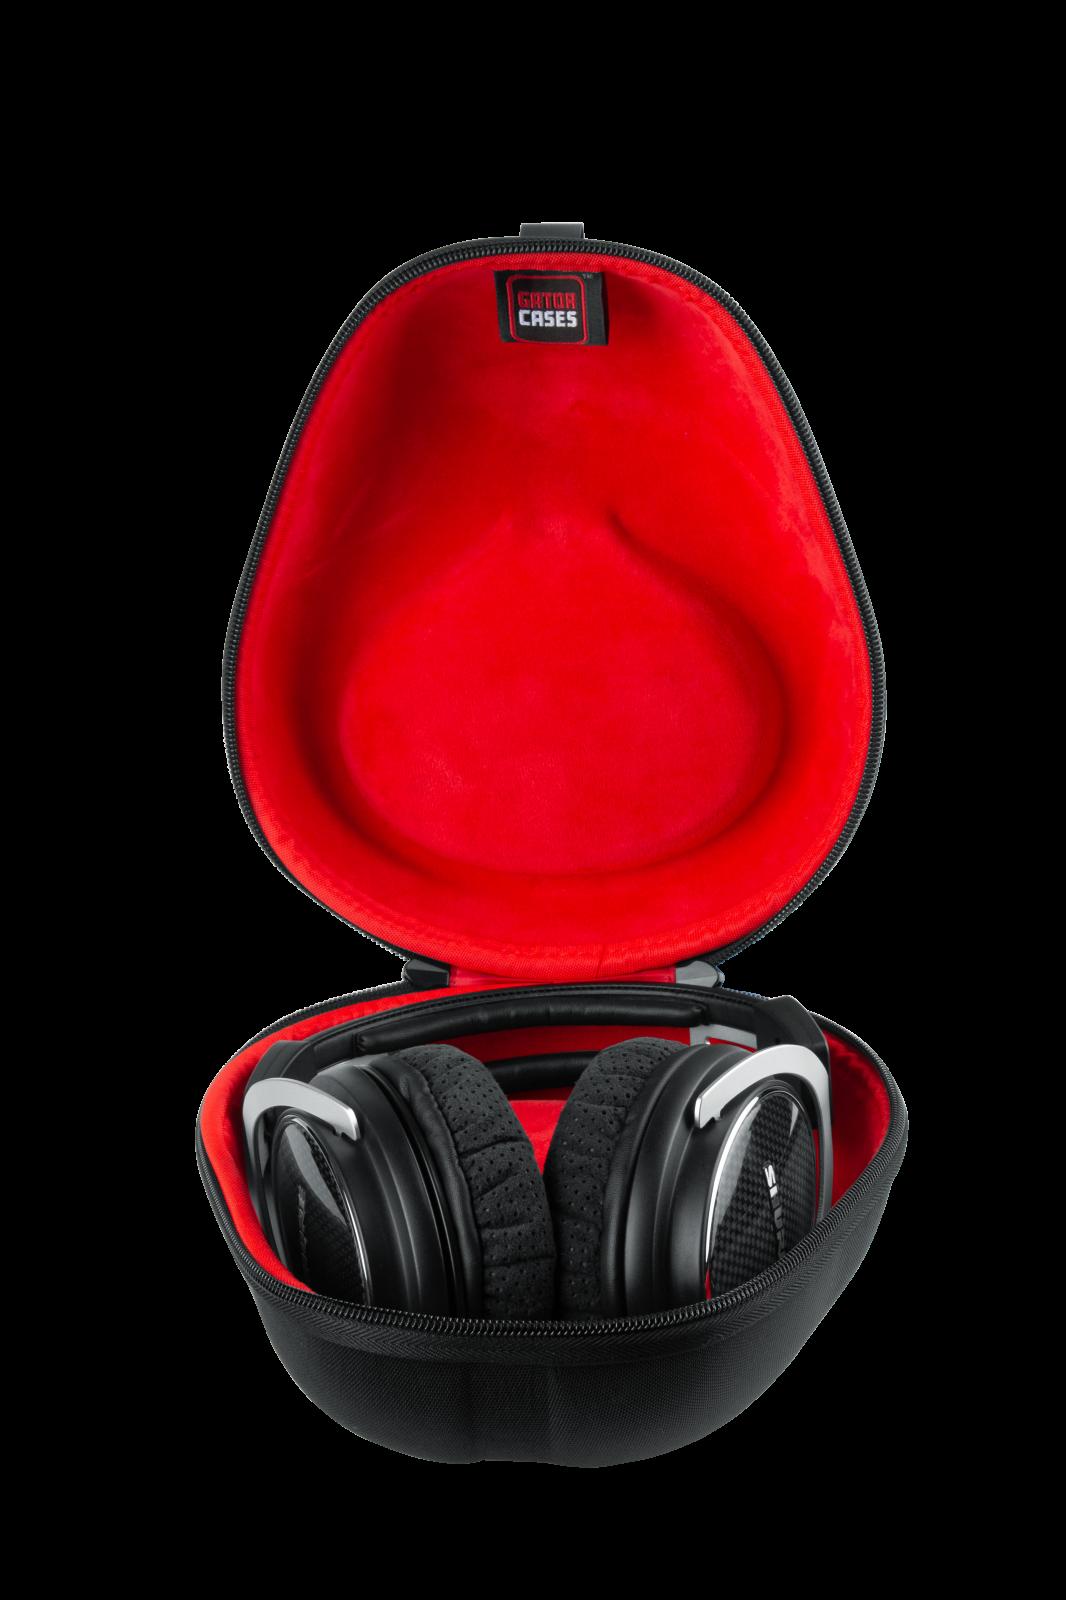 Gator G-HEADPHONE-CASE Molded Case for Folding & Non-Folding Headphones – Black Color